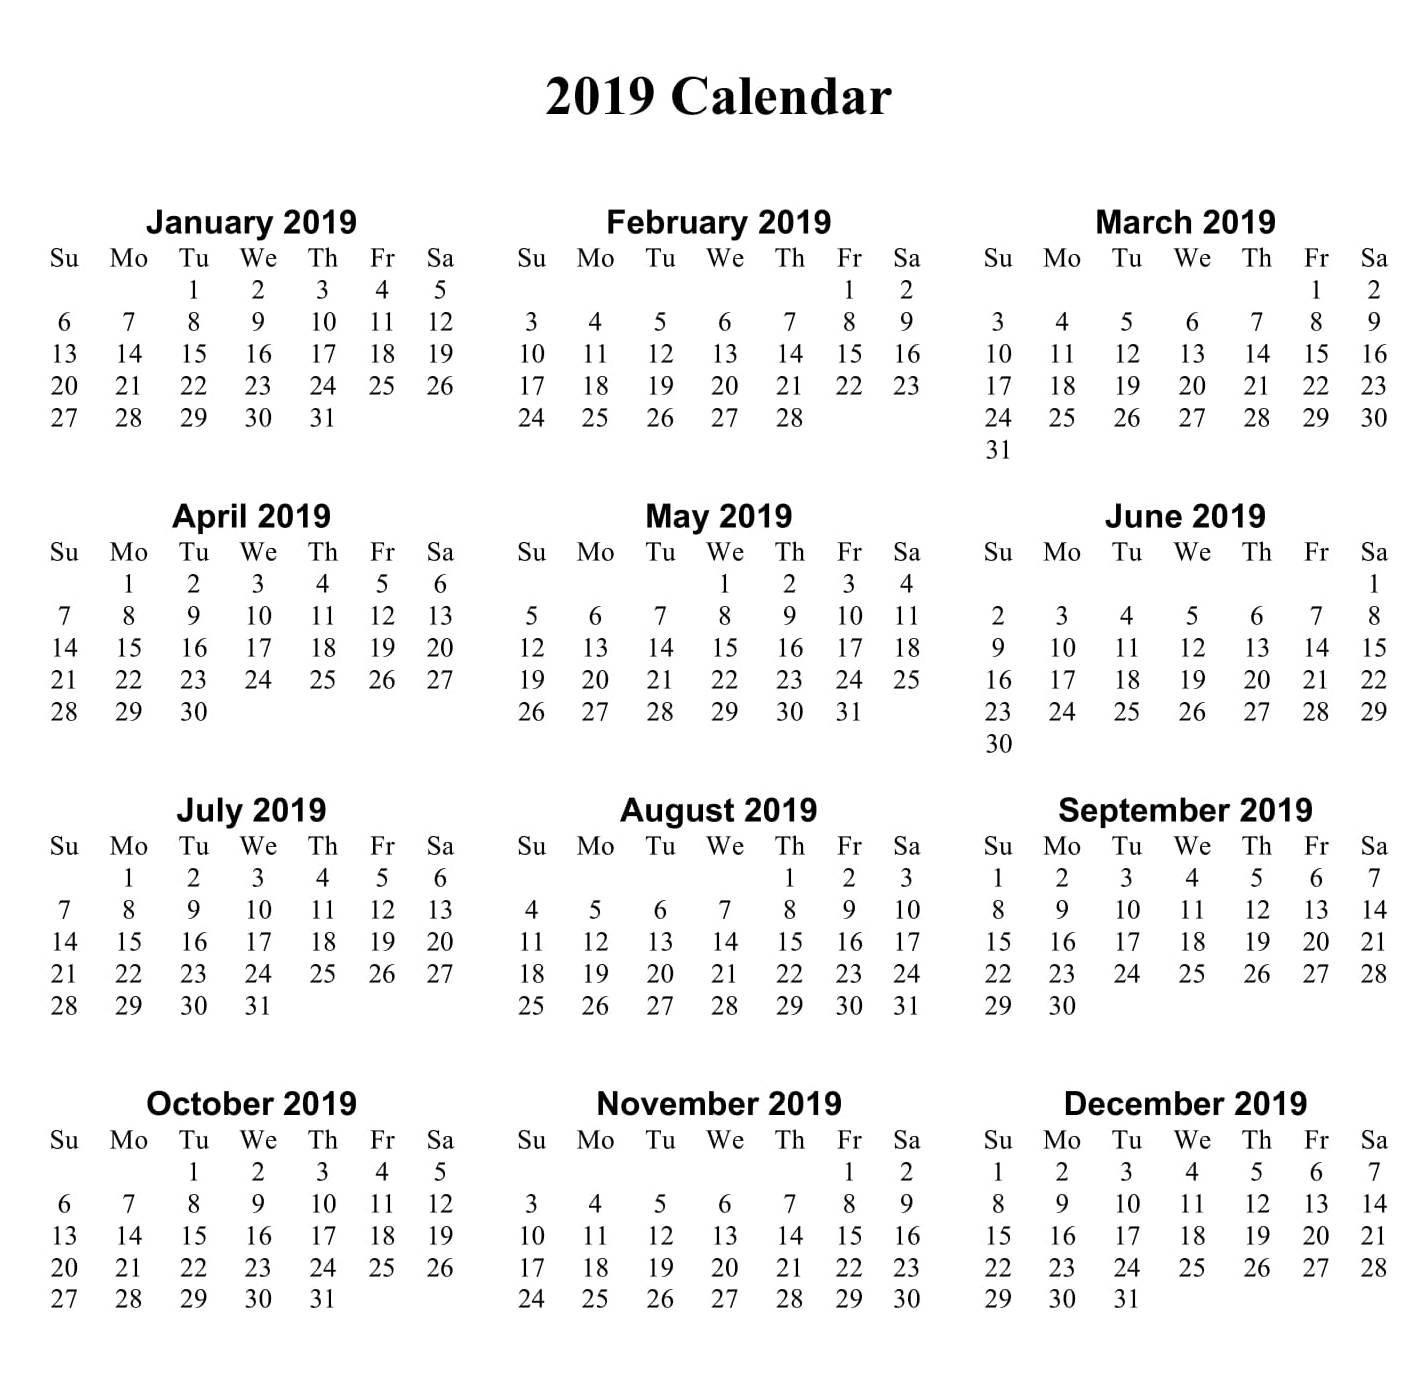 Print Off Yearly Calendar 2019 | Free Calendar Templates Calendar 2019 Small